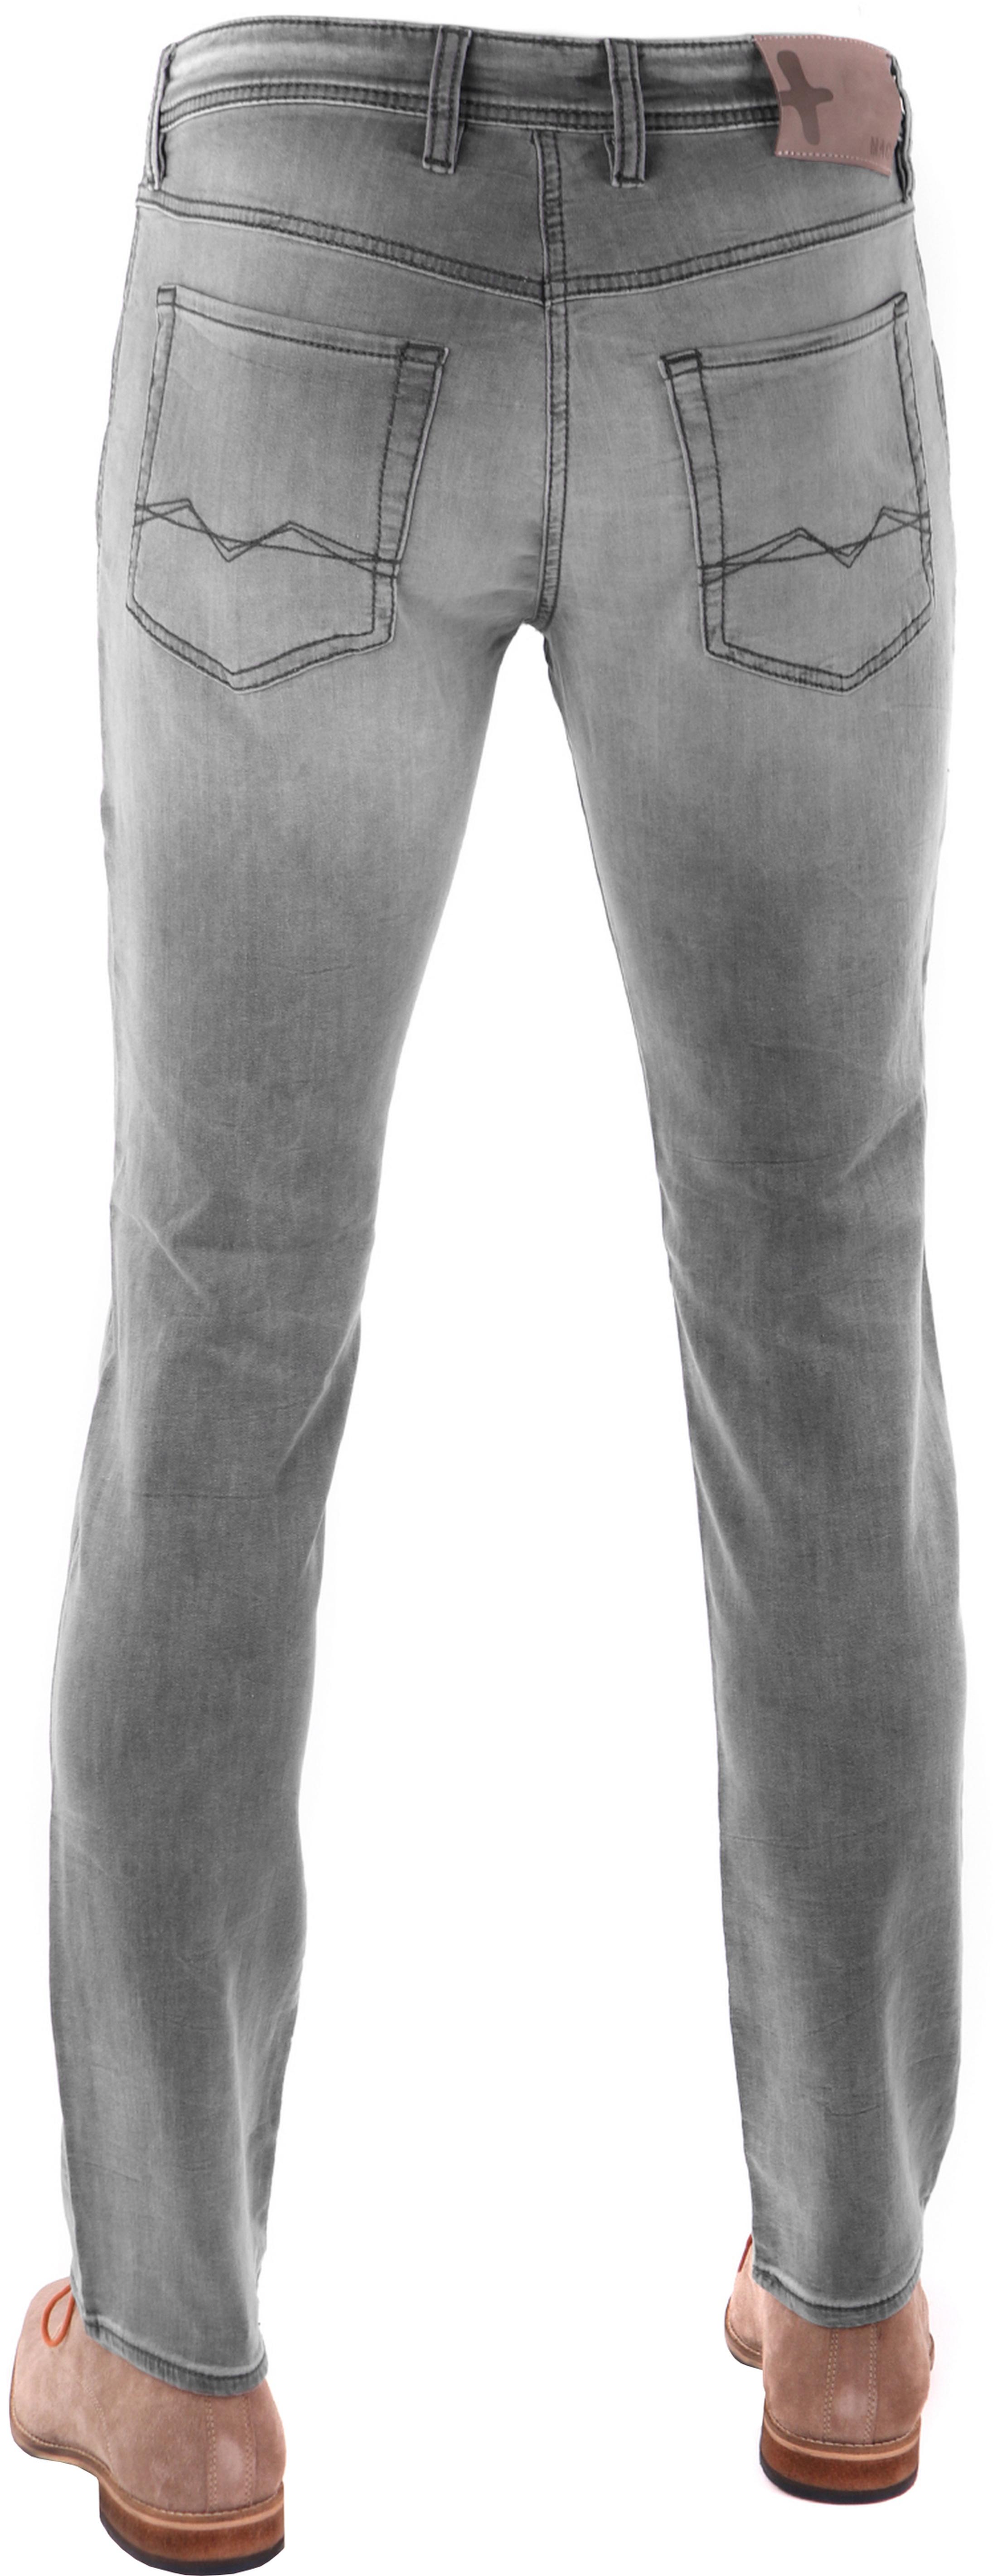 Mac Jog N Jeans Grey H825 foto 3